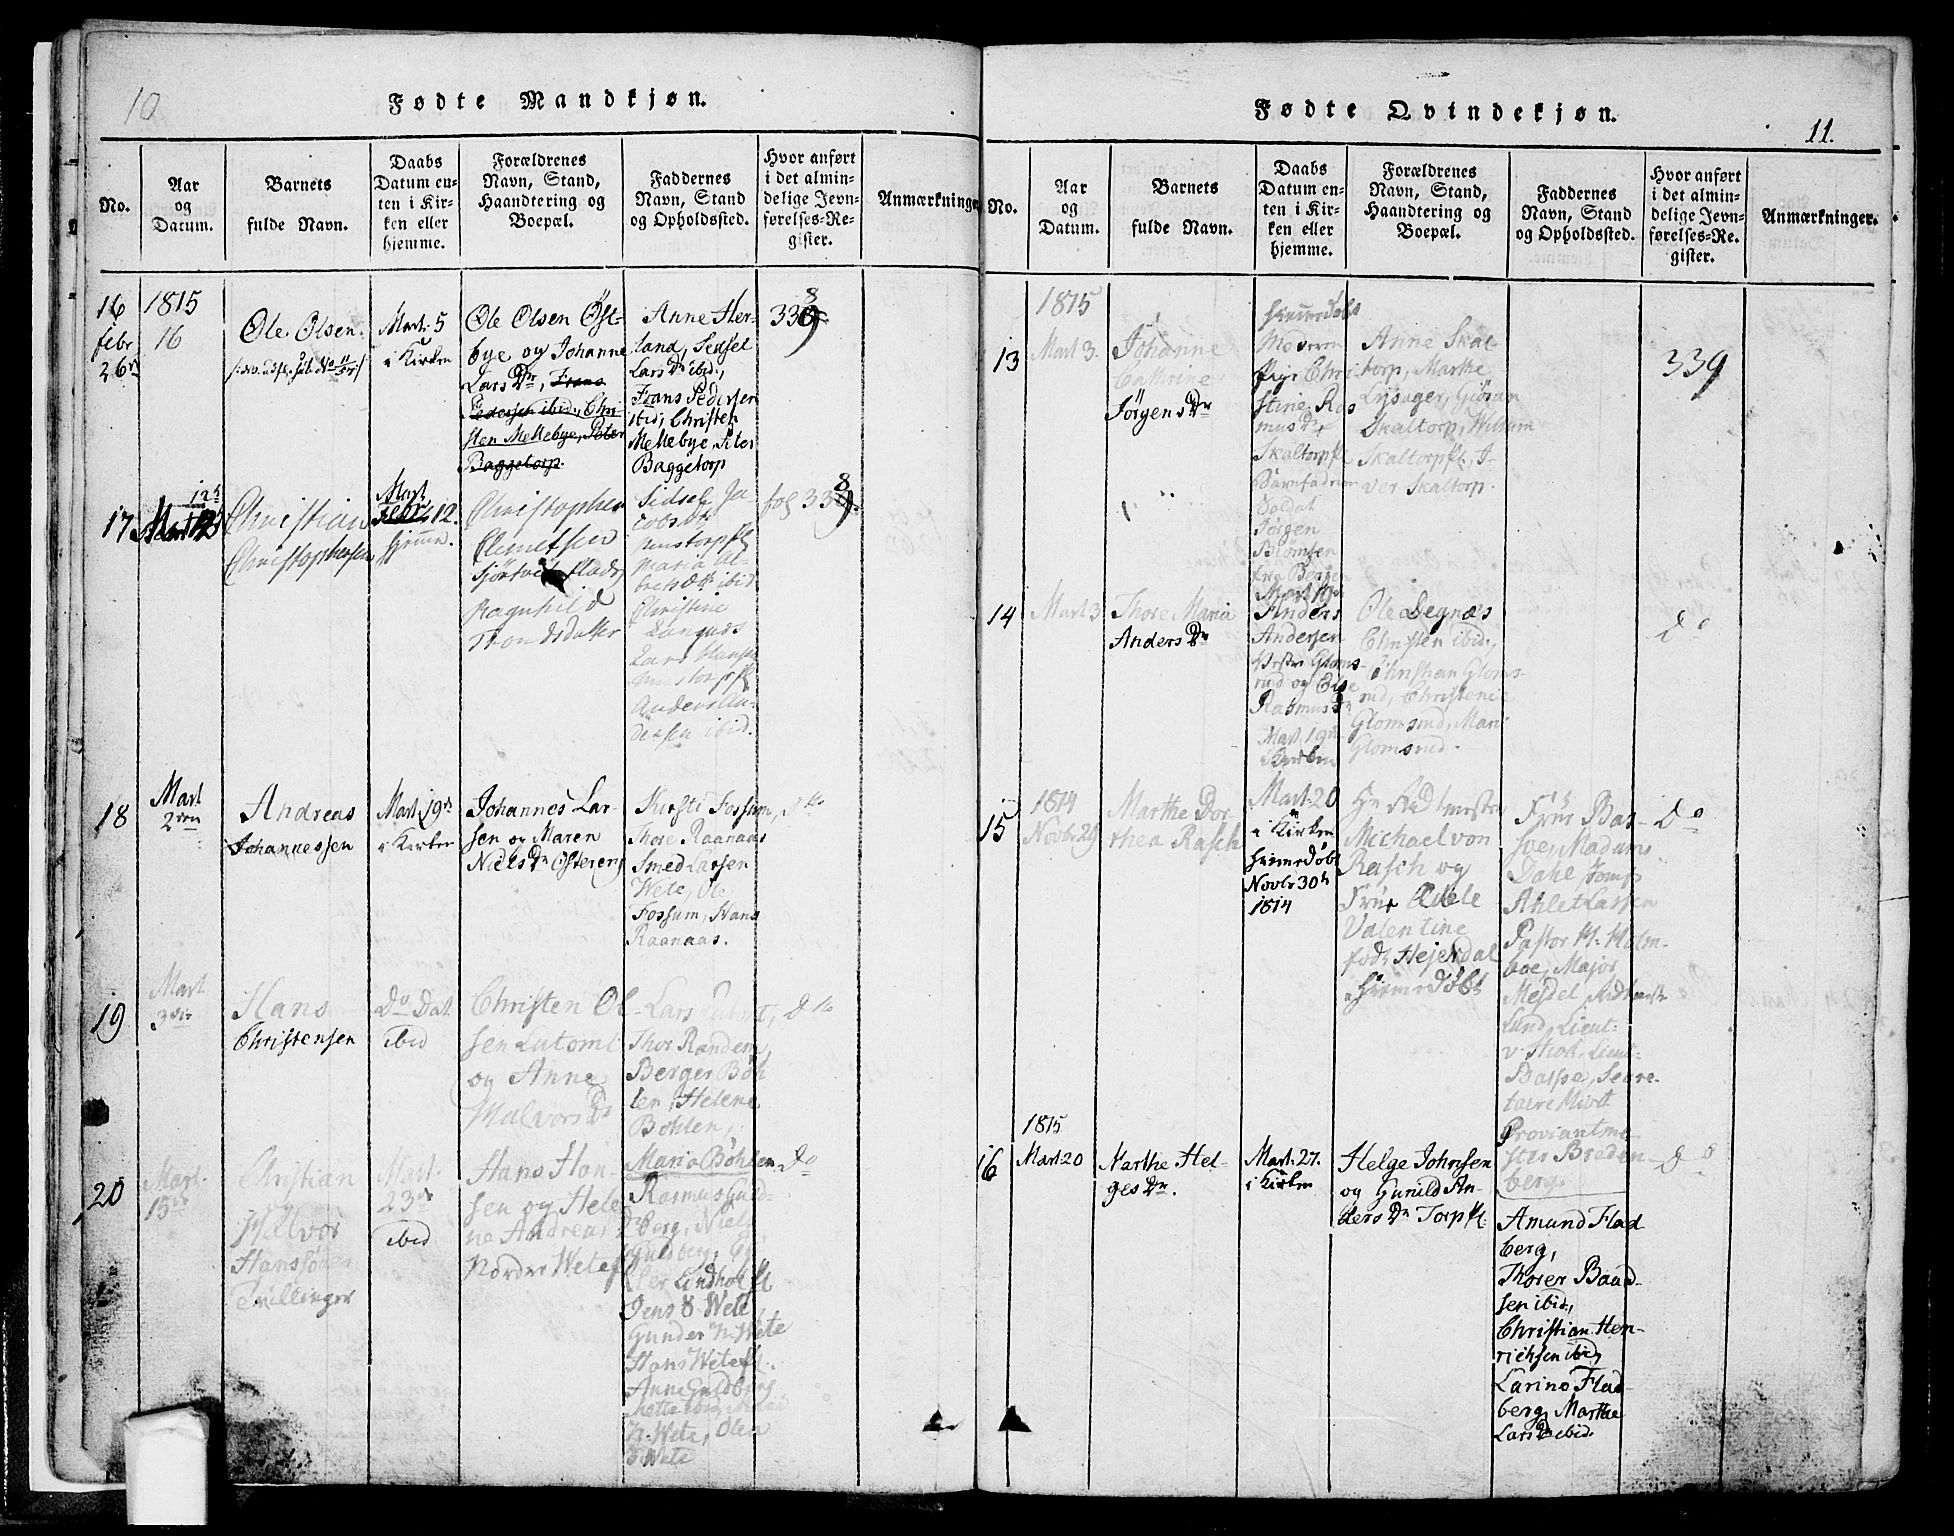 SAO, Eidsberg prestekontor Kirkebøker, F/Fa/L0007: Ministerialbok nr. I 7, 1814-1832, s. 11